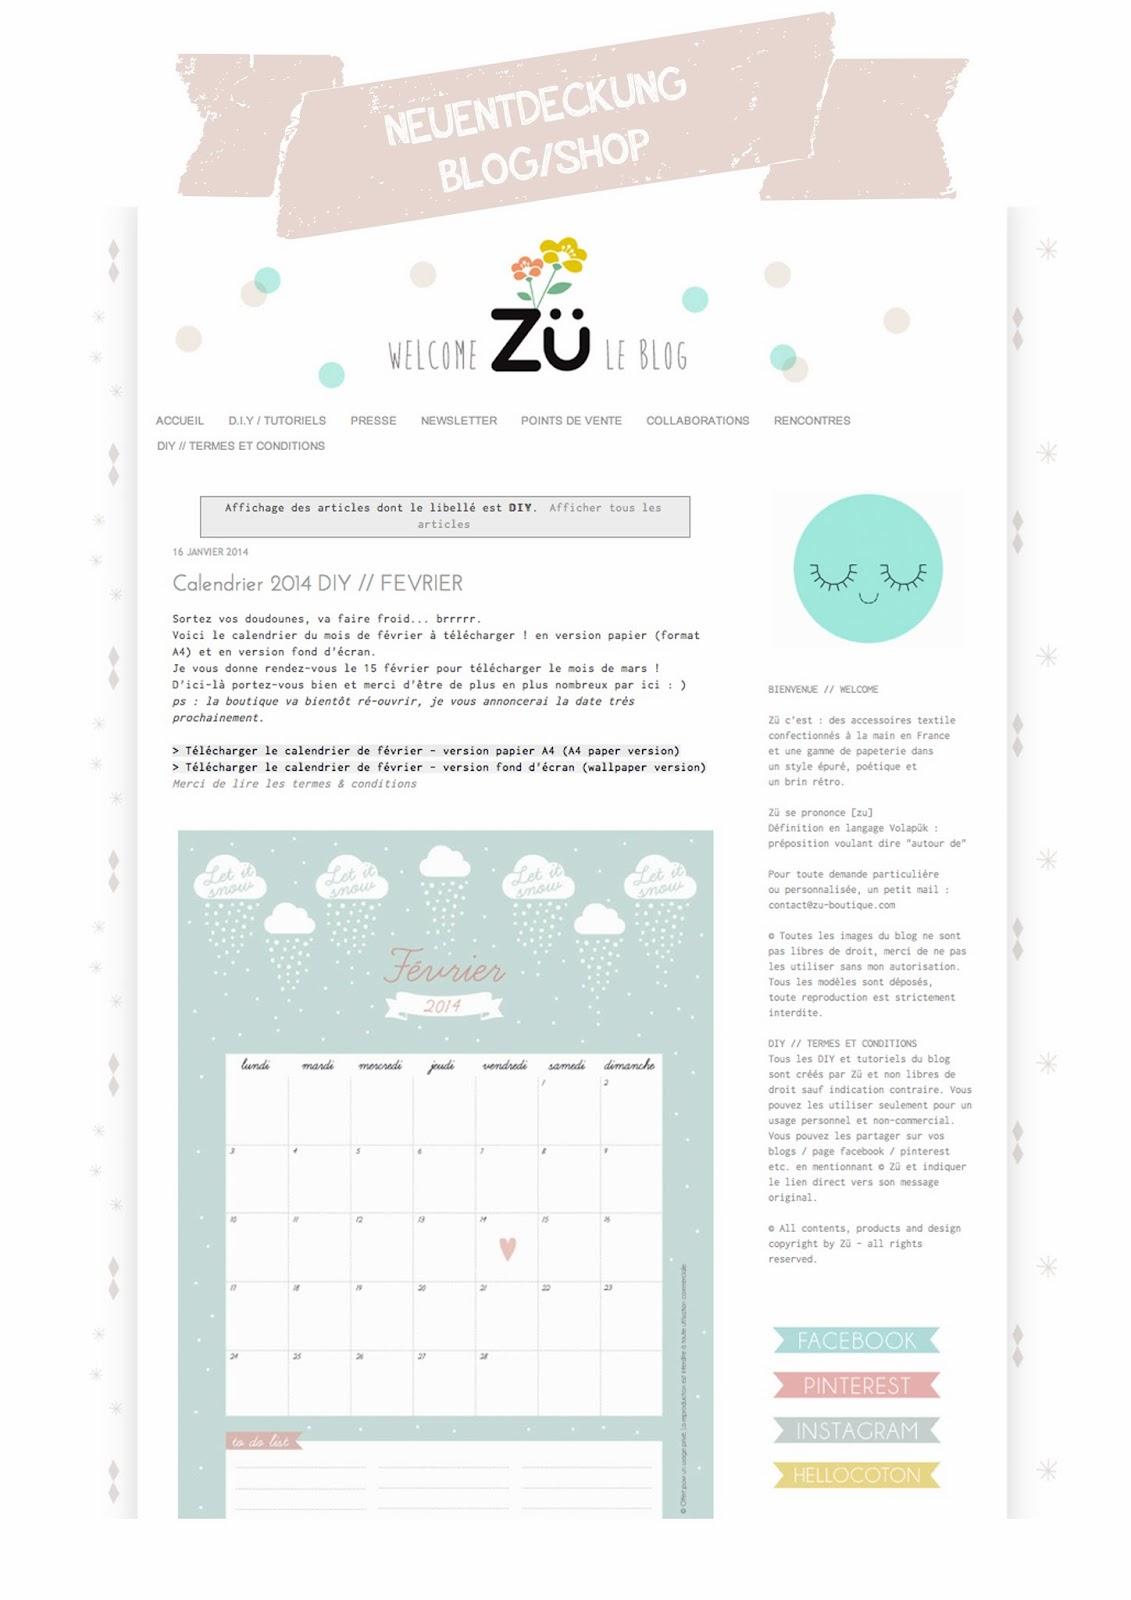 Blogliebling Zü